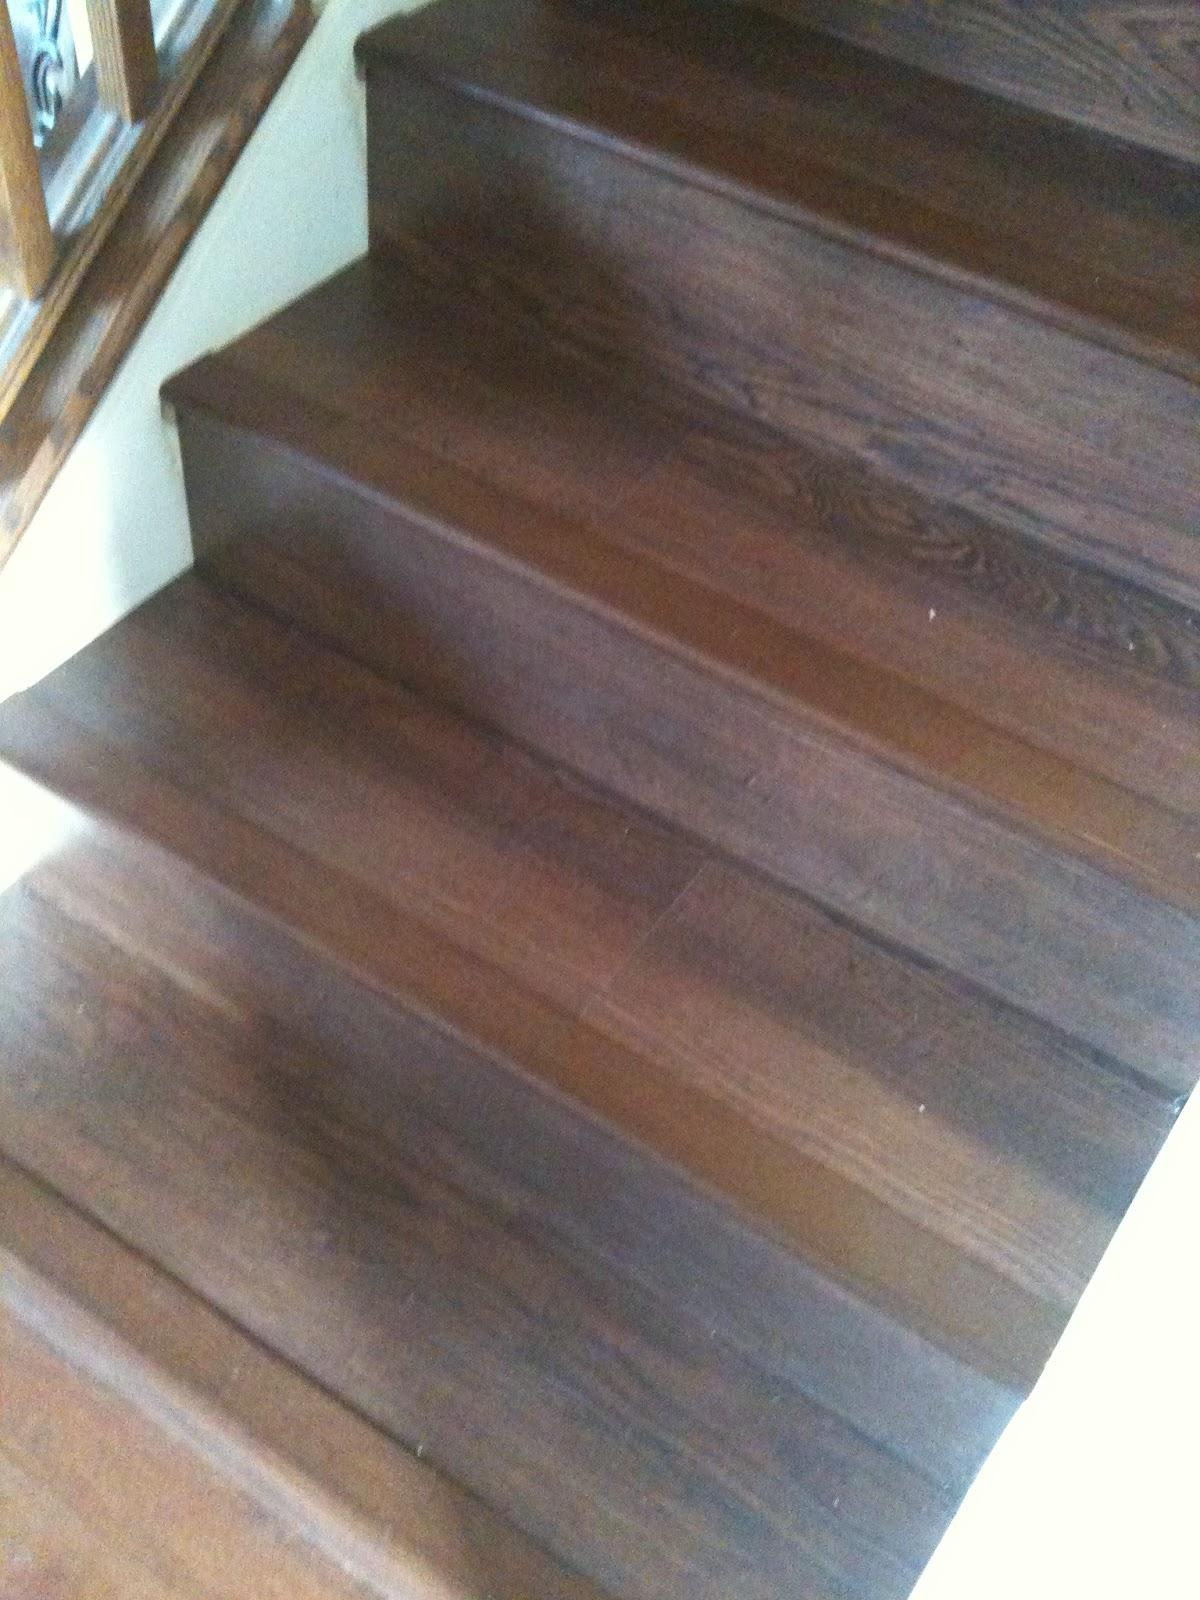 Laminate Flooring On Stairs Slippery Image